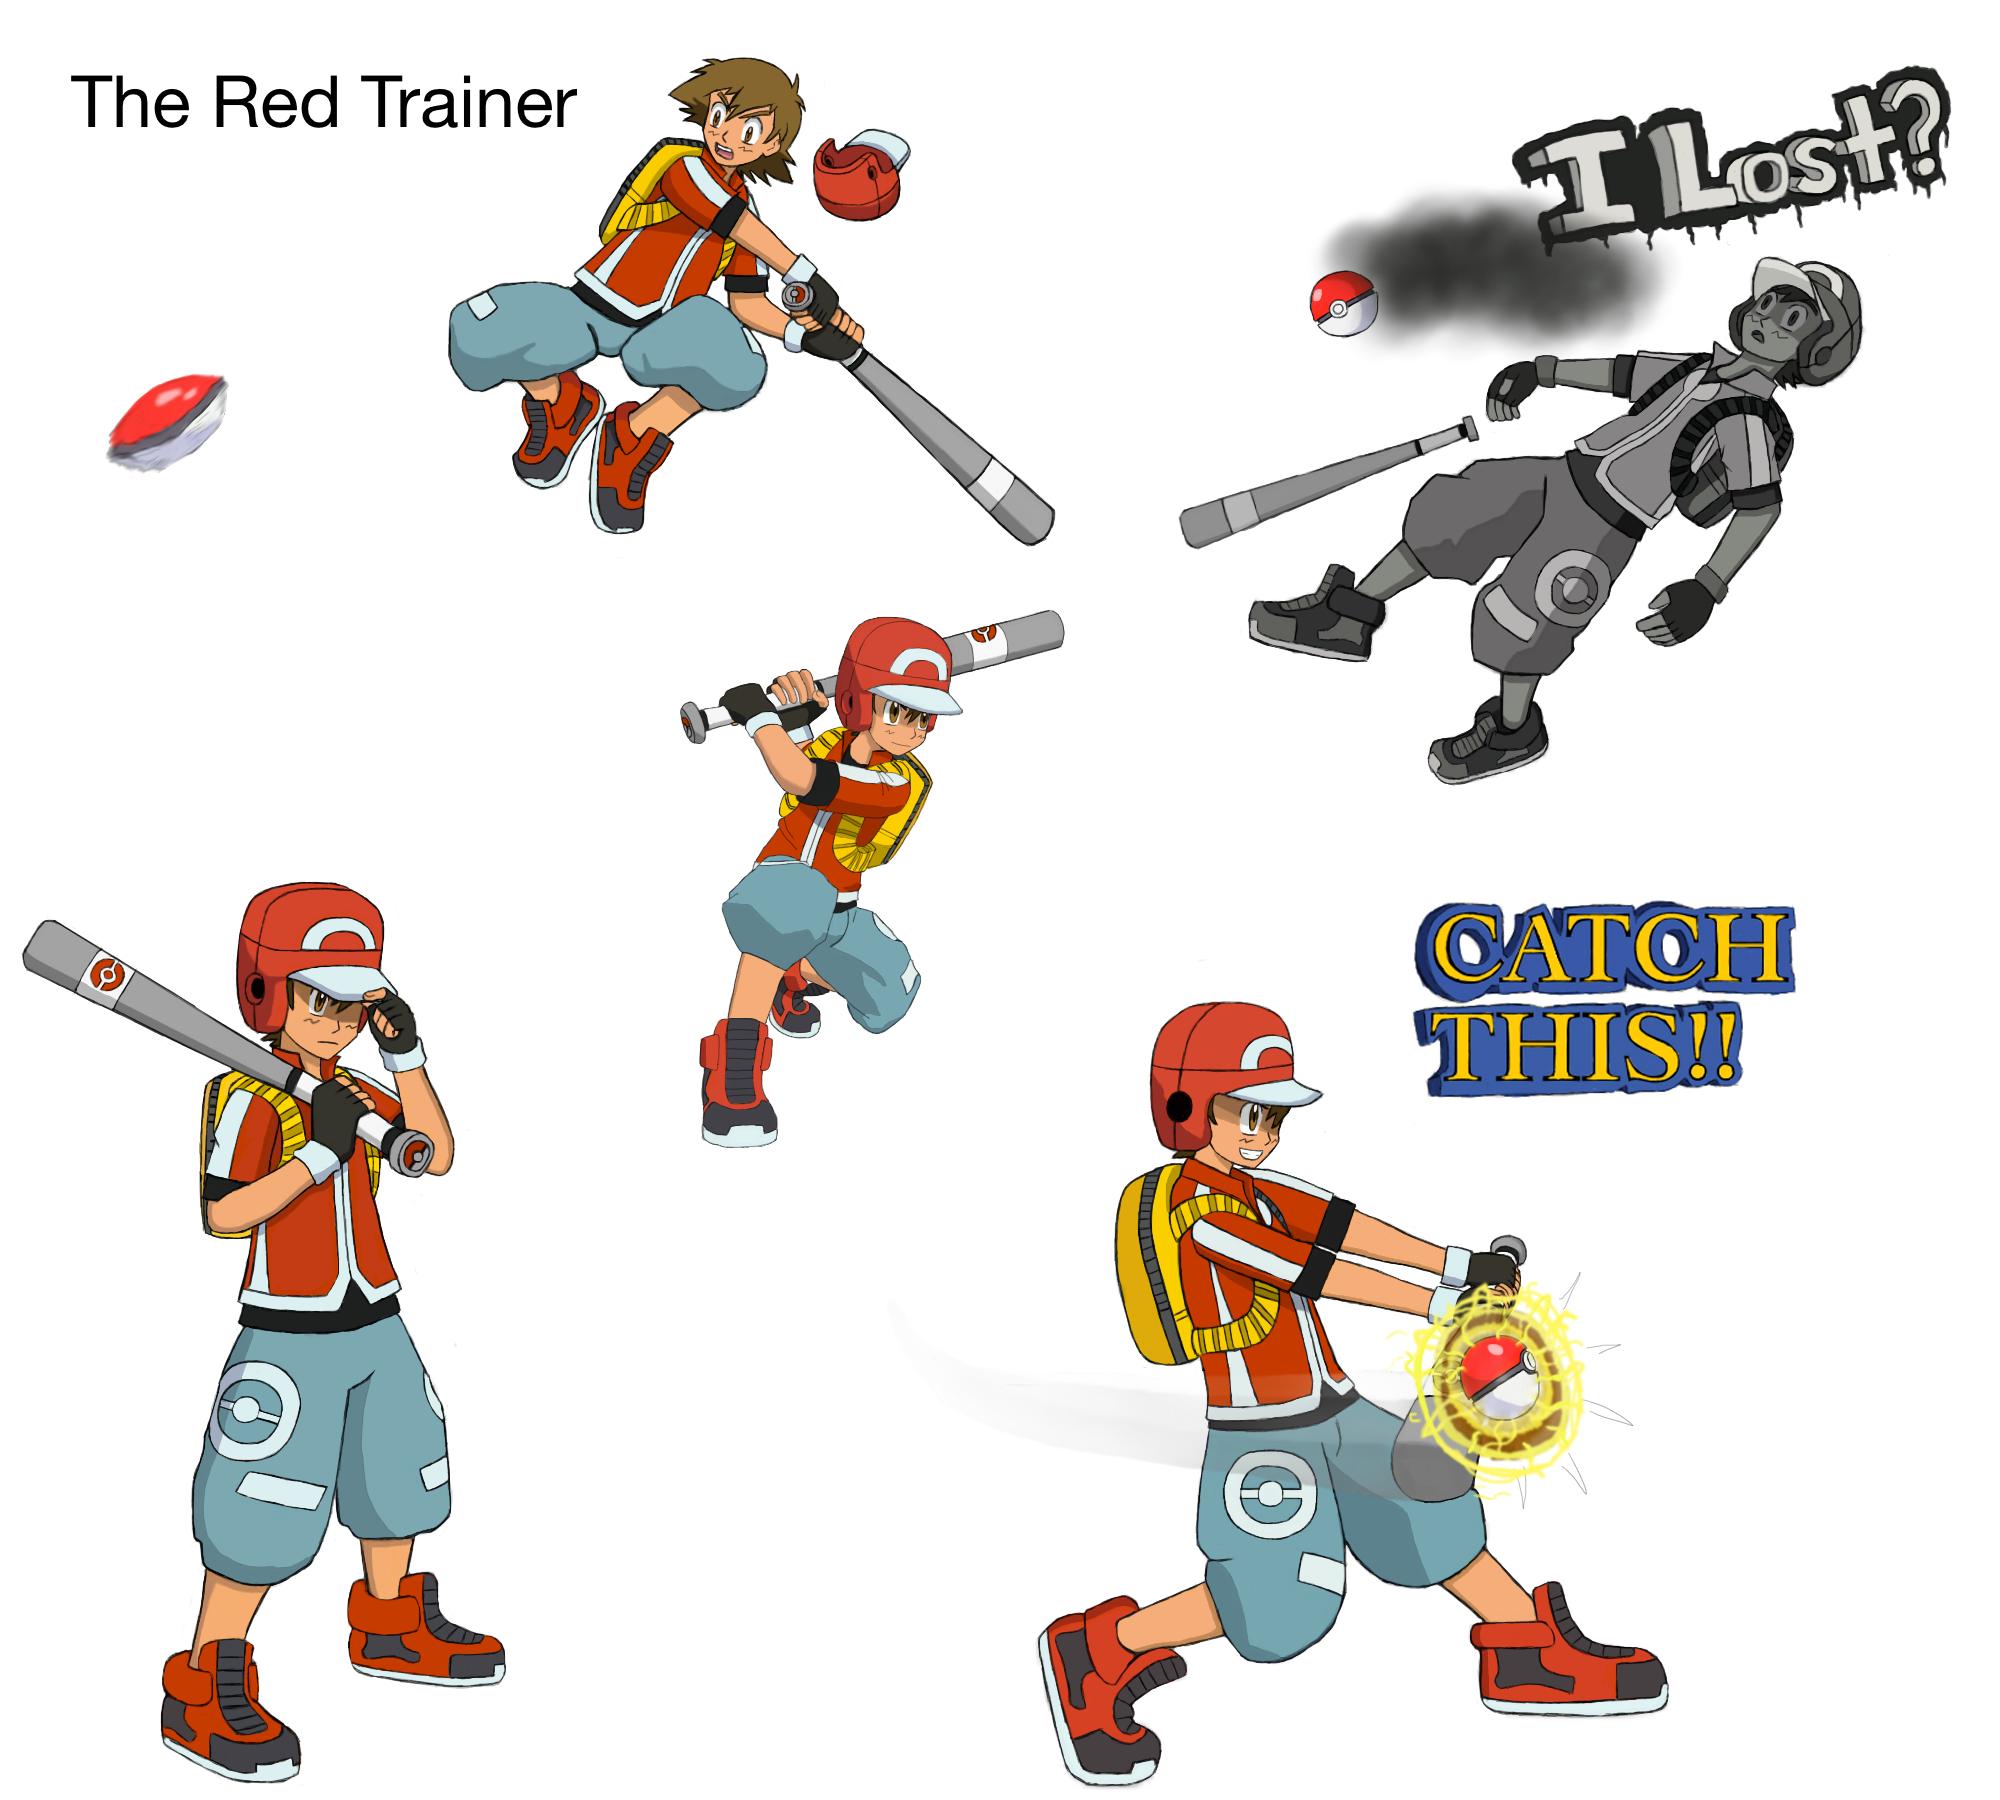 lethal pokemon league ash ketchum red trainer by james dean